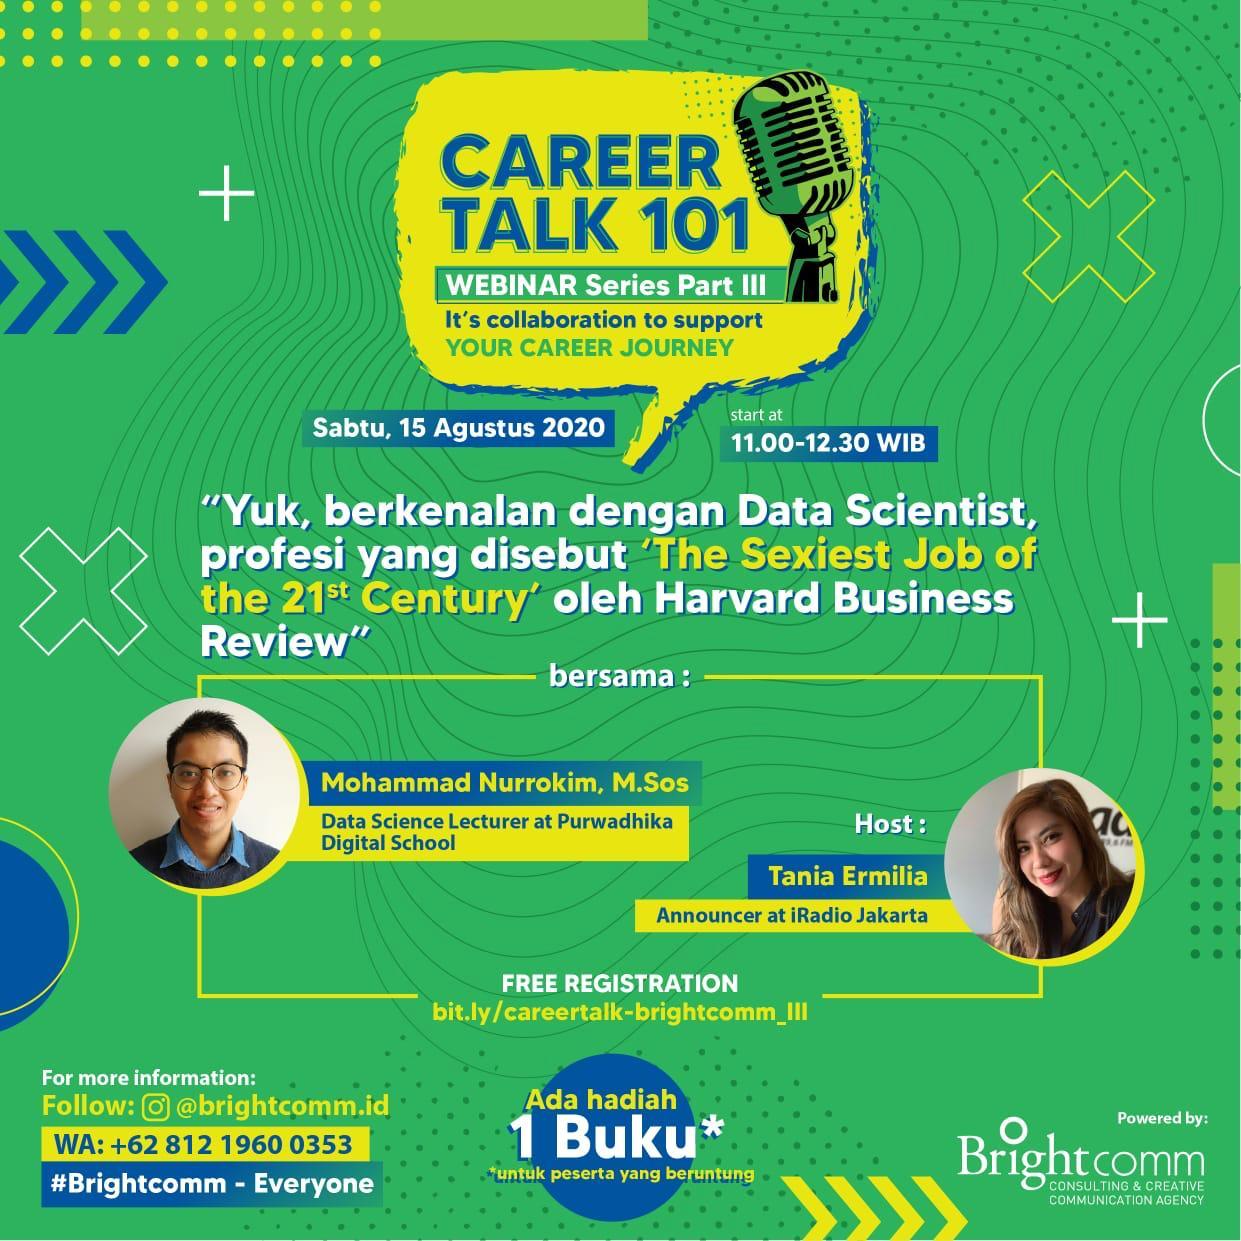 poster career talk part III